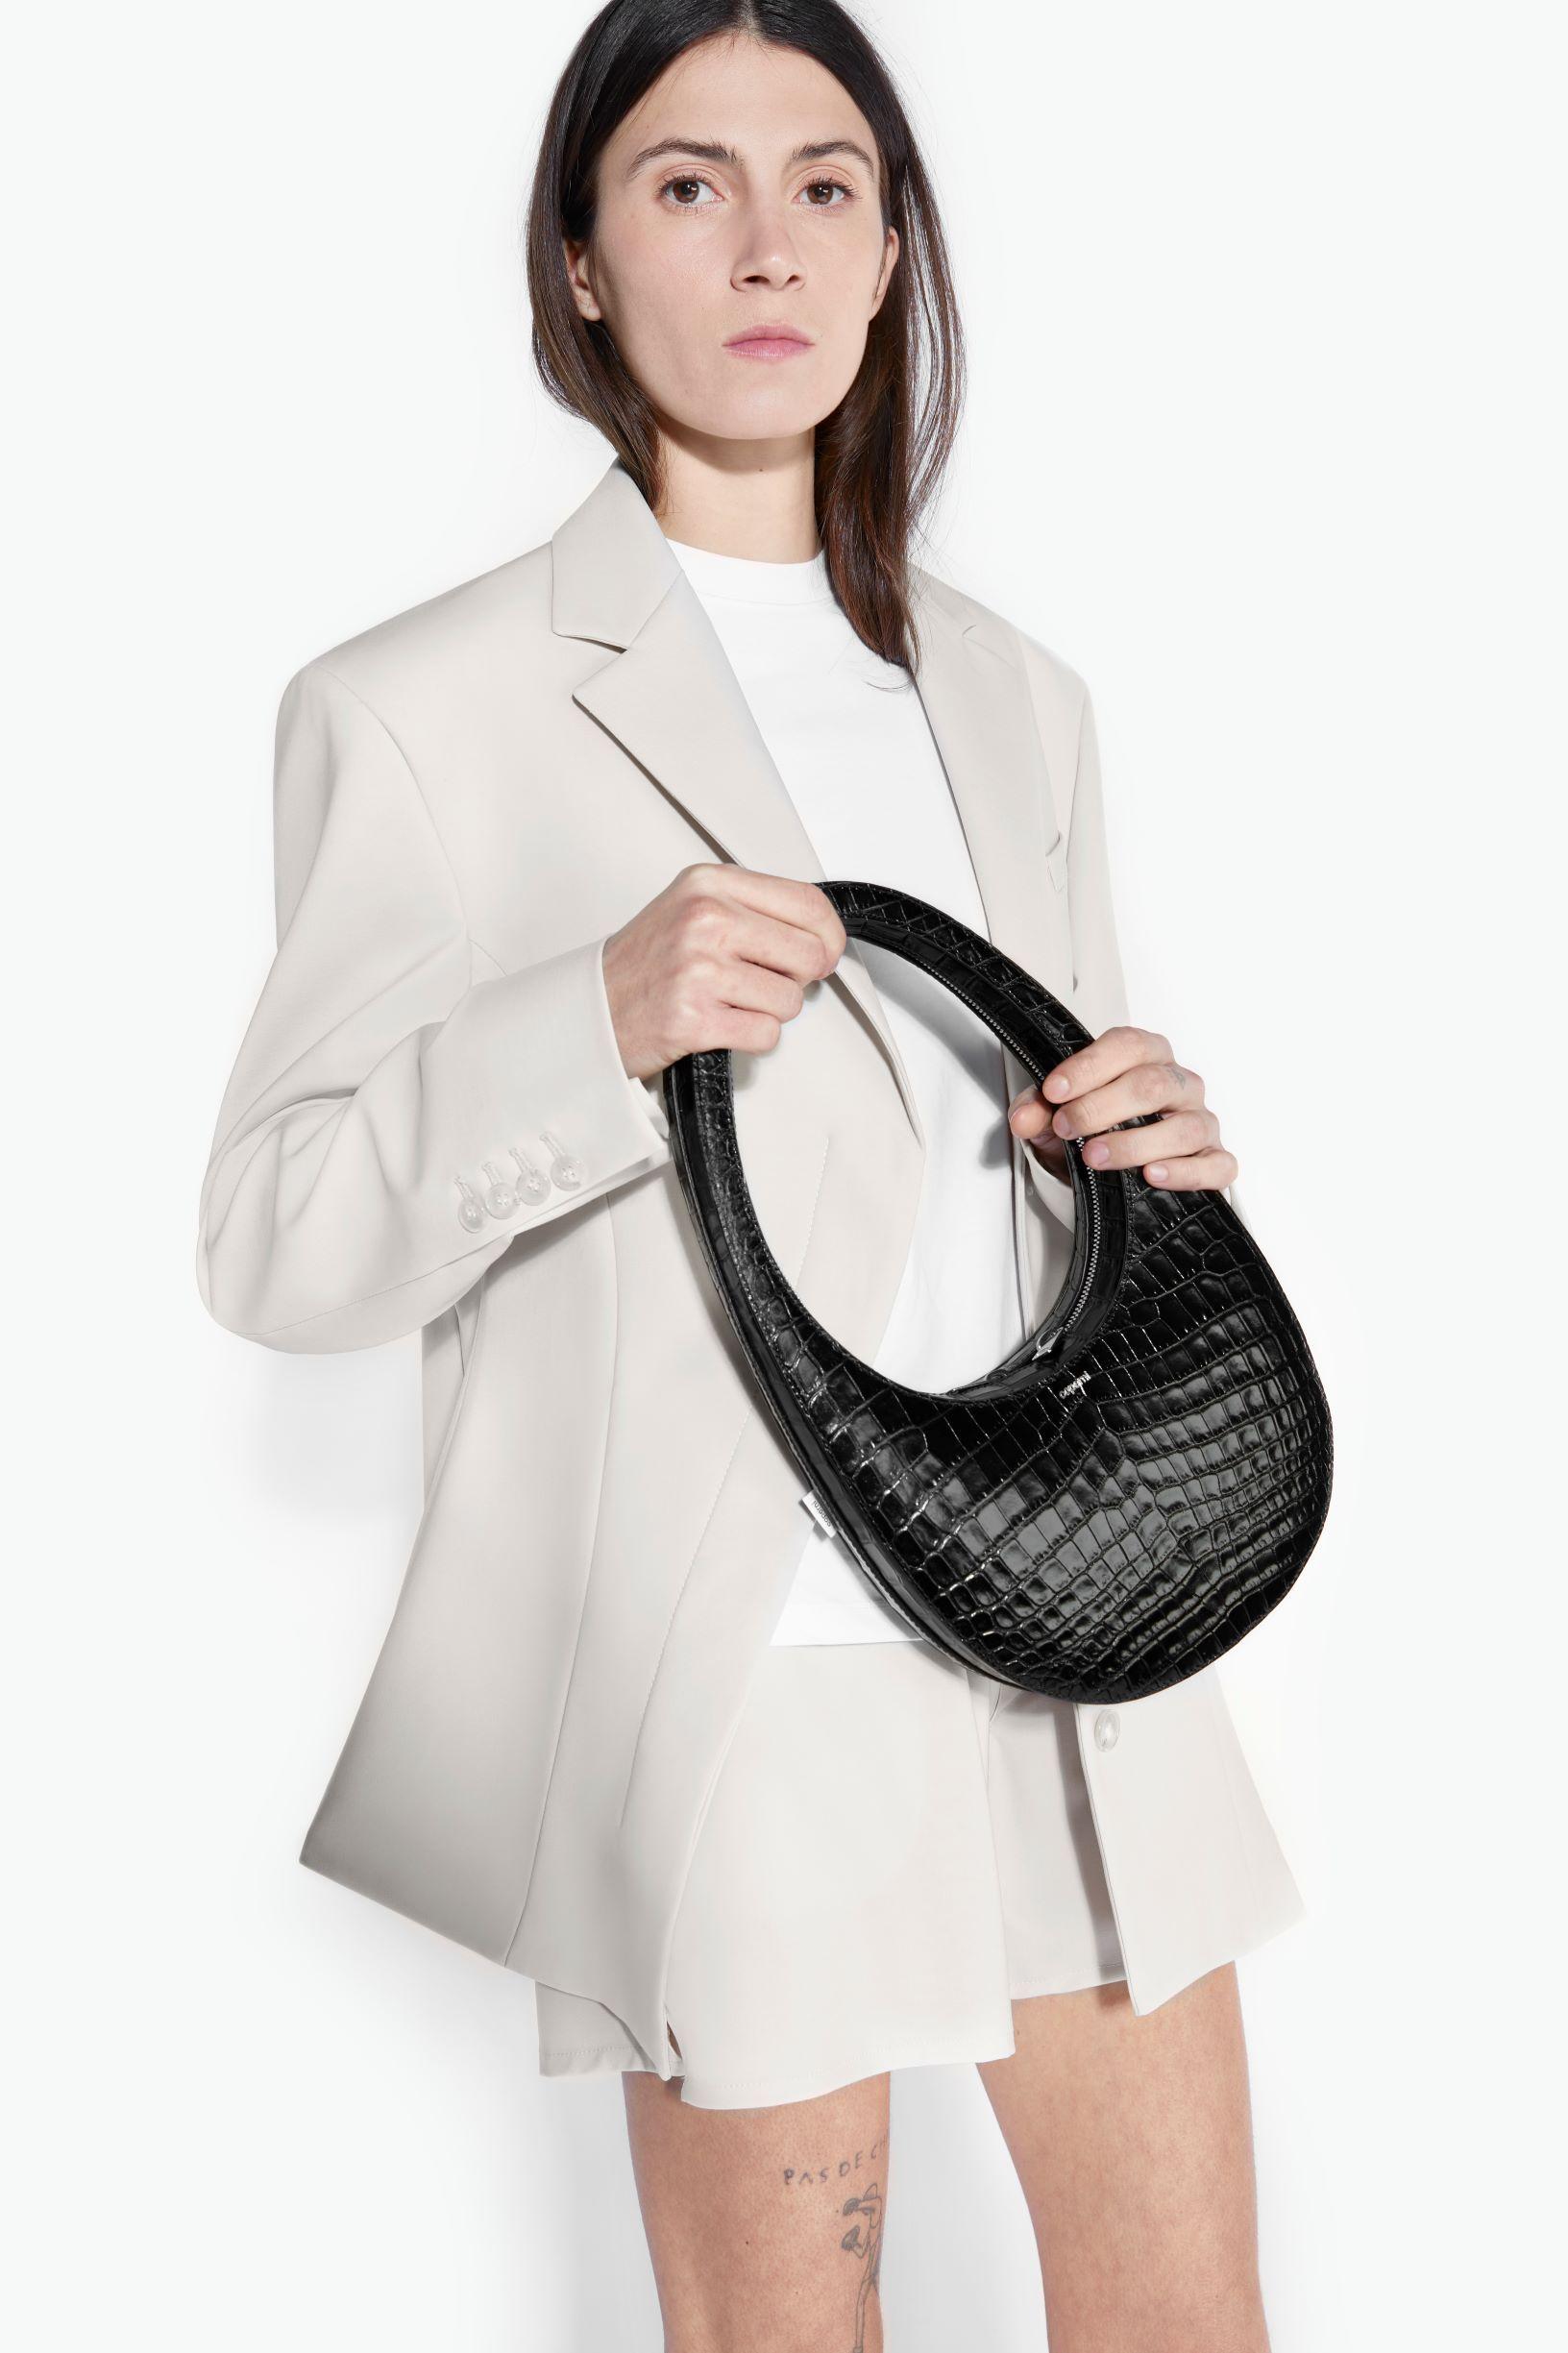 Coperni-Swipe-handbag Top 10 Latest Bag Trends Expected to Boom in 2021/2022